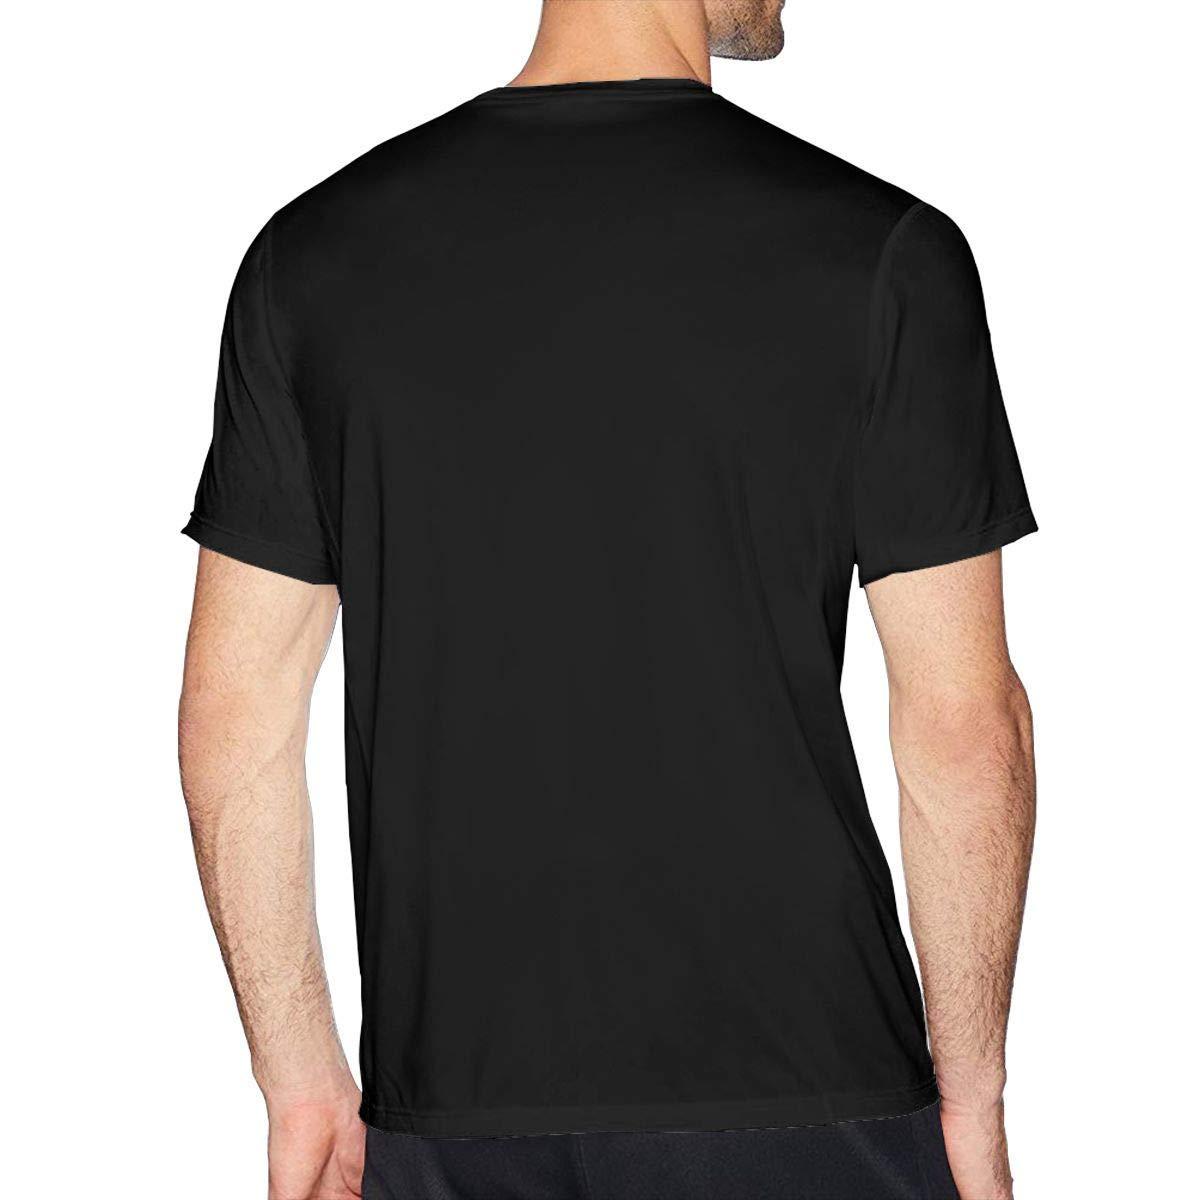 PEGGYNCO Mens Particular My Hero Academia T-Shirt Black